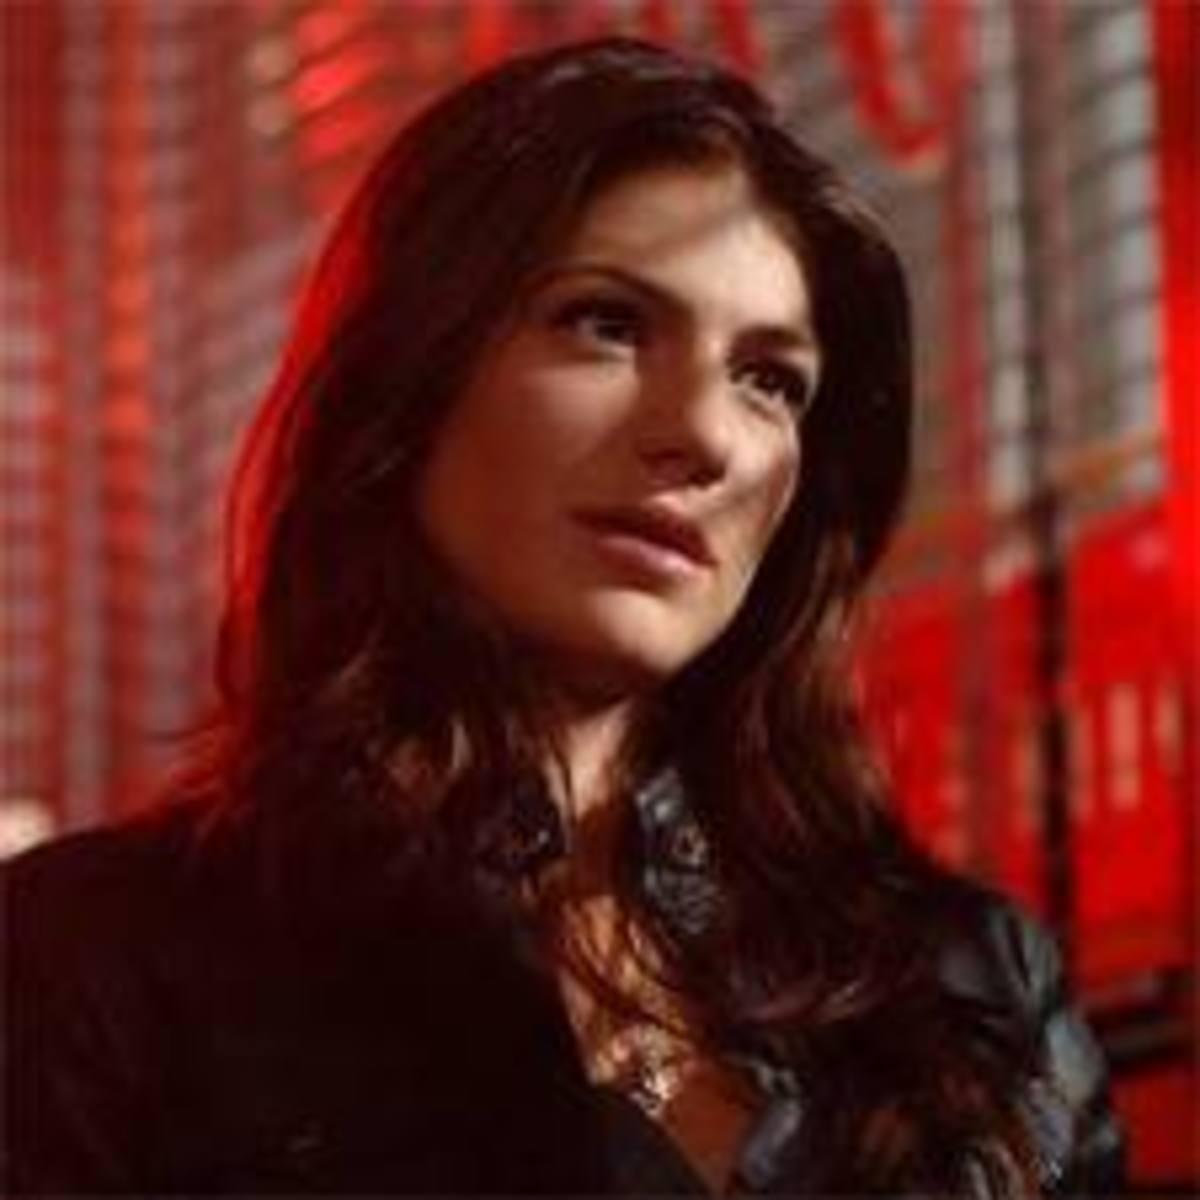 Supernatural: Ruby